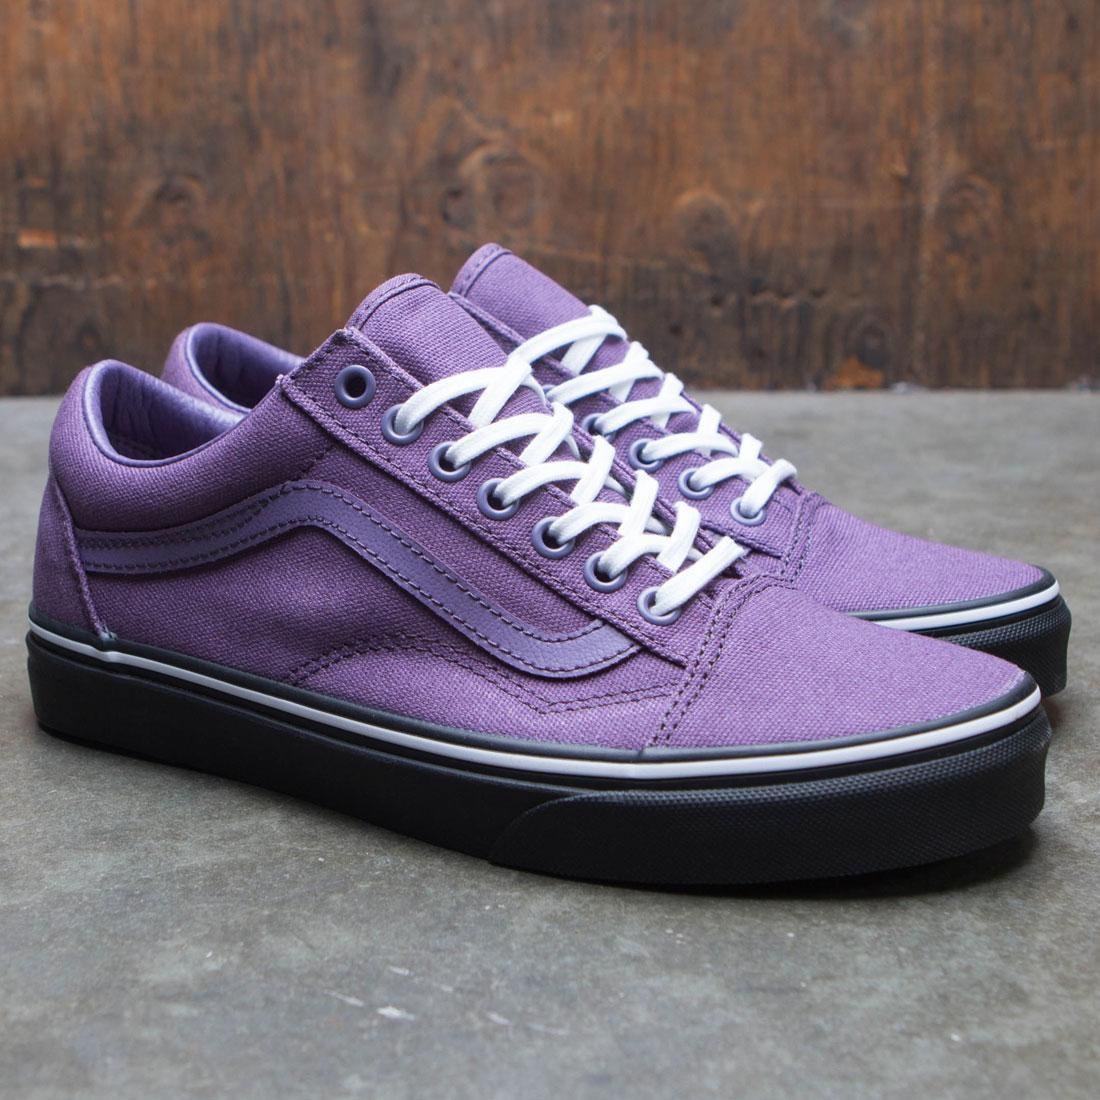 a6bf068058 Vans Men Old Skool - Black Outsole (purple   grape   black)